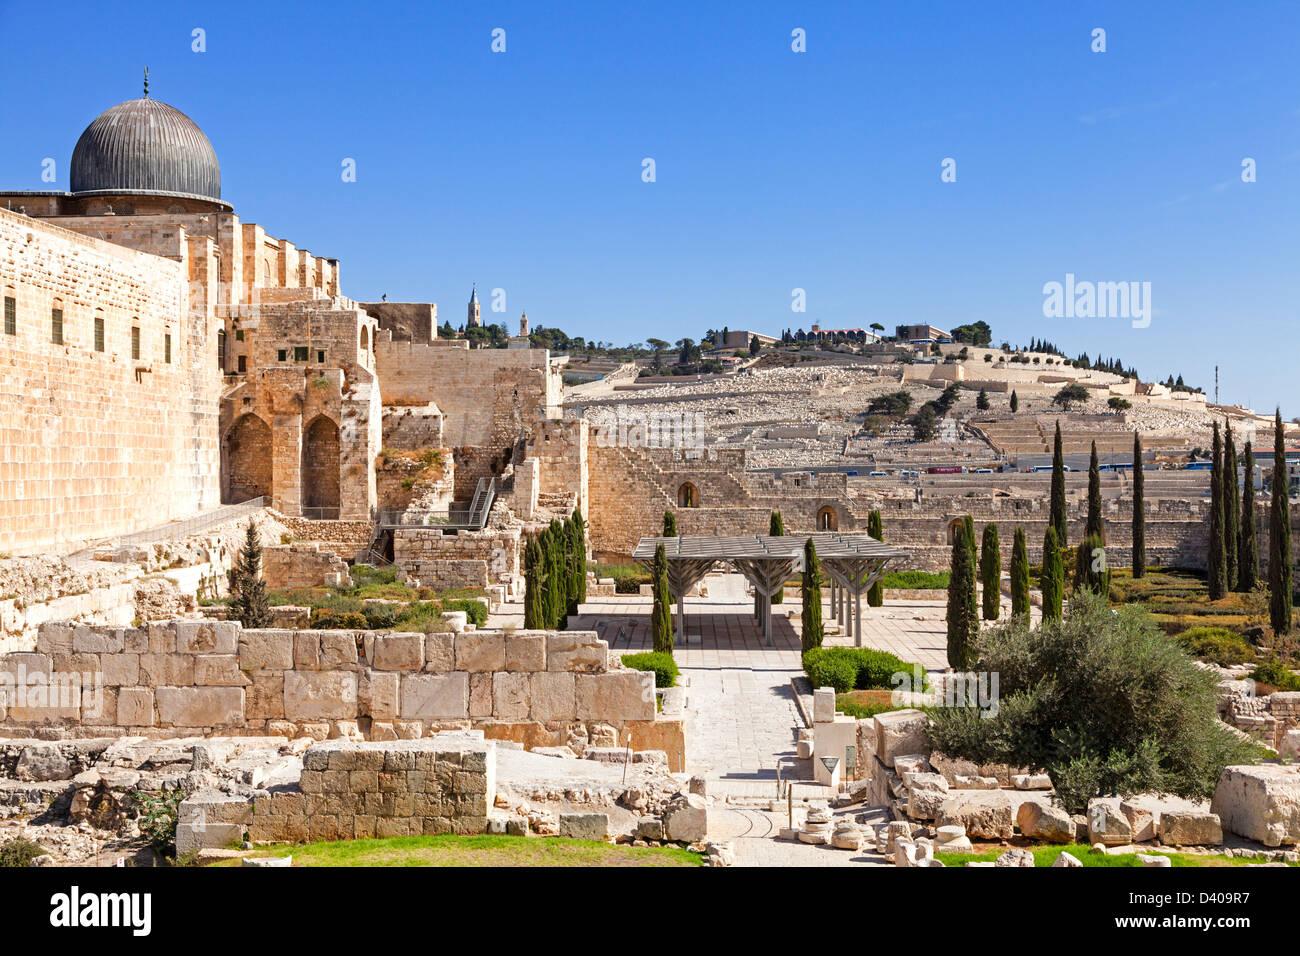 City wall of Jerusalem - Stock Image